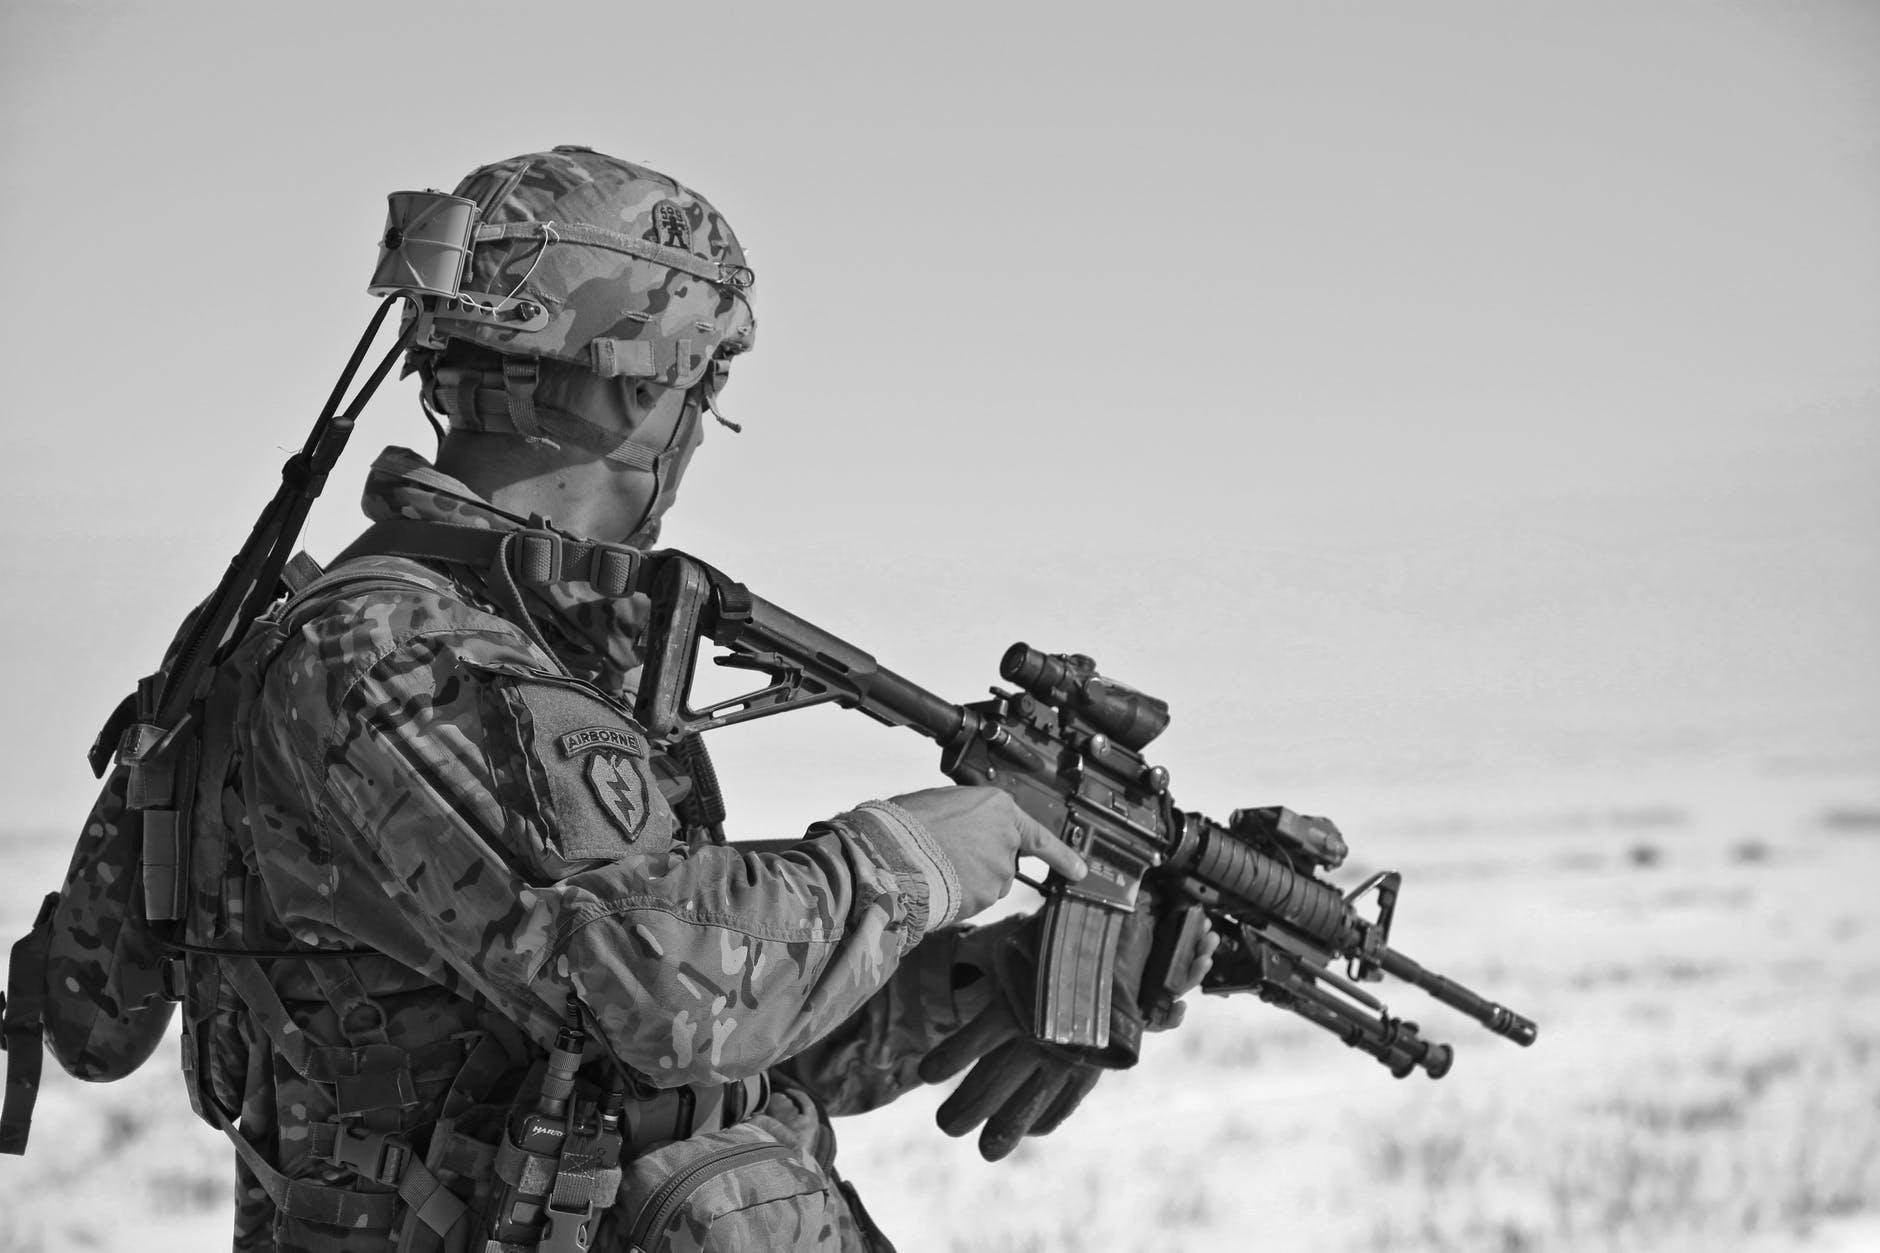 soldier-uniform-army-weapon-41161.jpeg